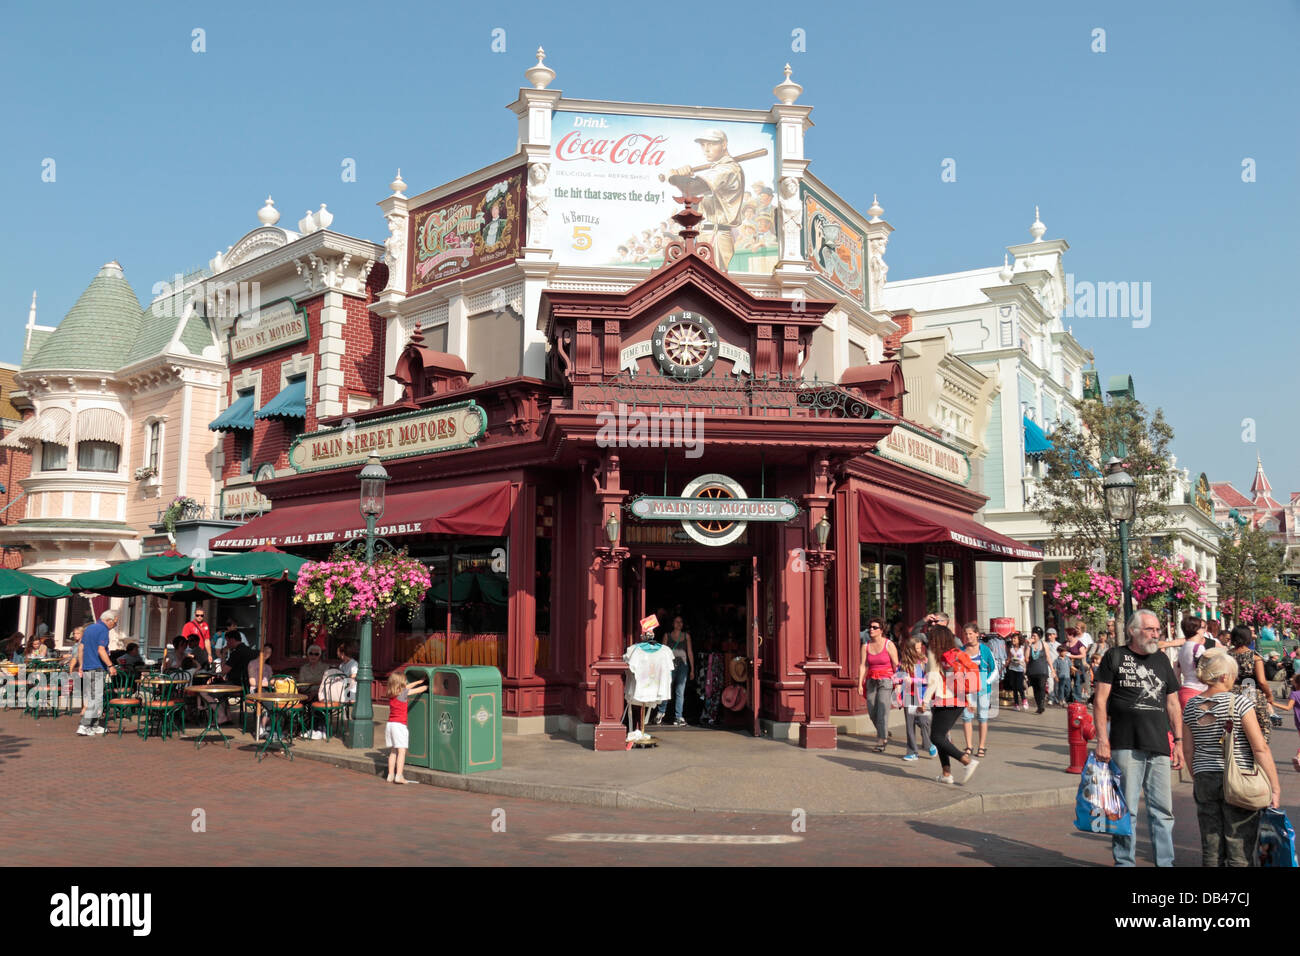 Fashion Outlet Disneyland Paris